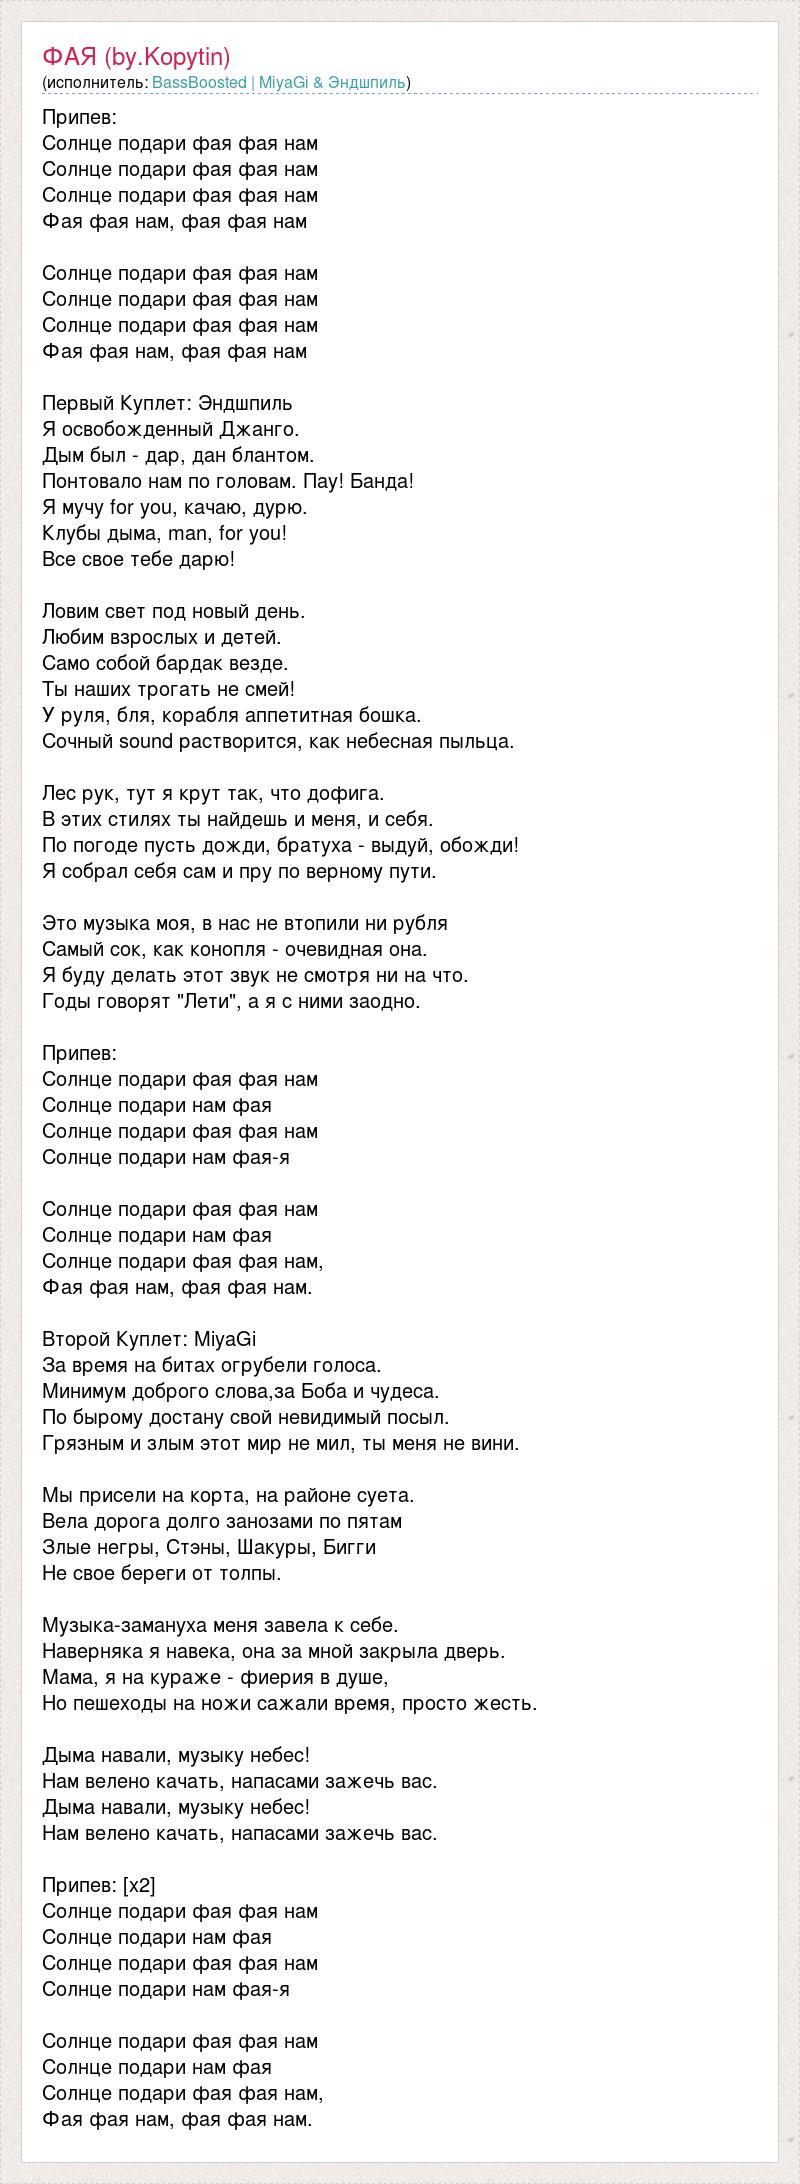 Тексты песен про конопля музыка из фаркрая 3 конопля